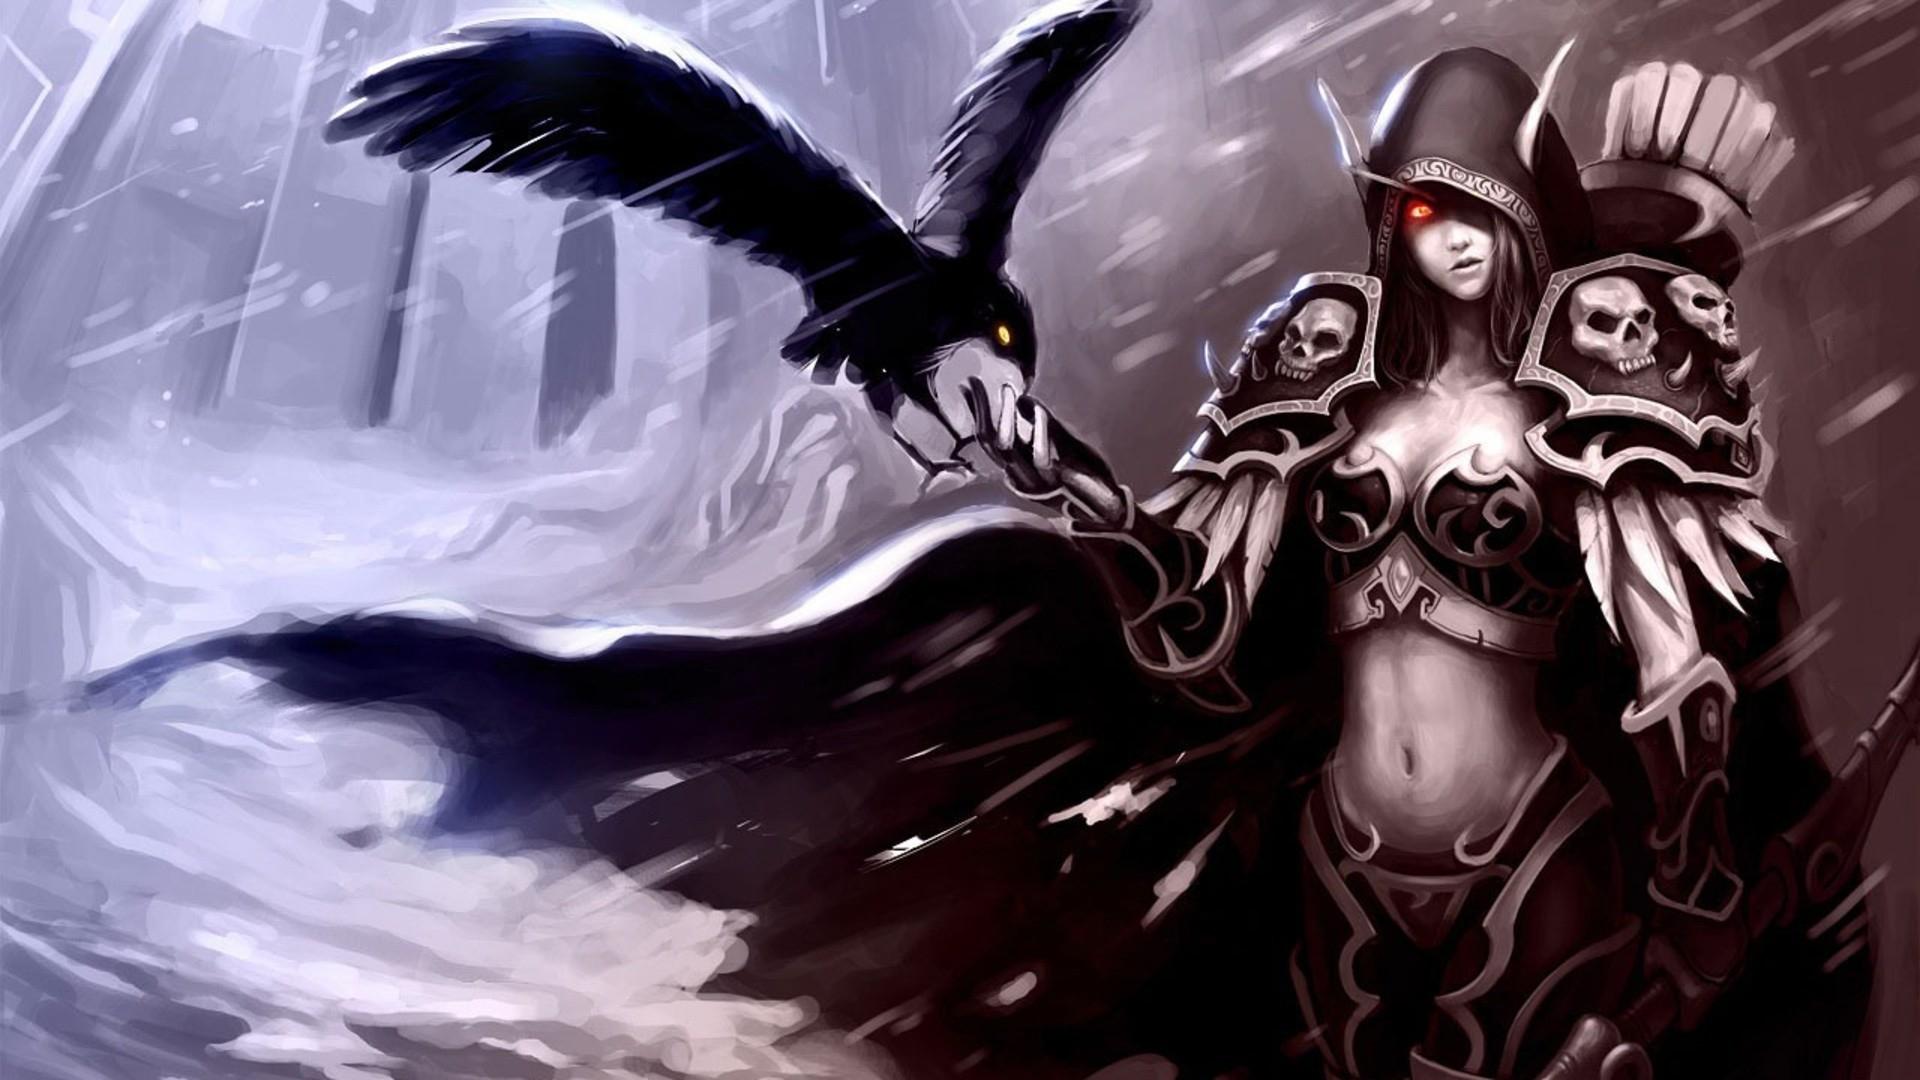 Wallpaper world of warcraft, blood elf, bird, hand, female